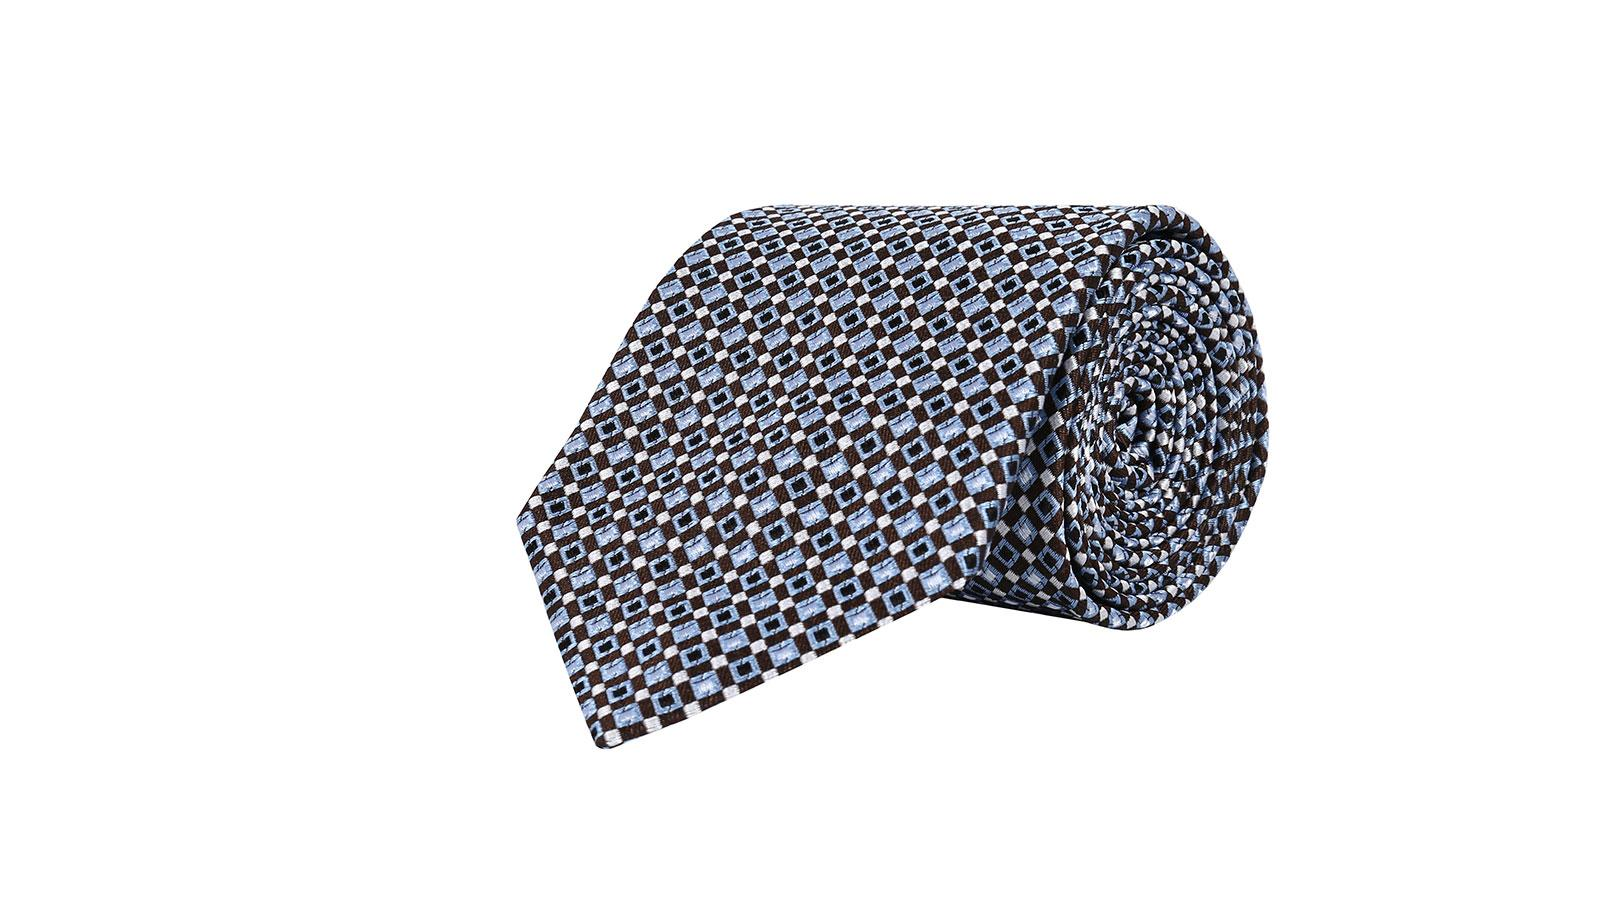 Brown & Blue Micropatterned Silk Tie - slider image